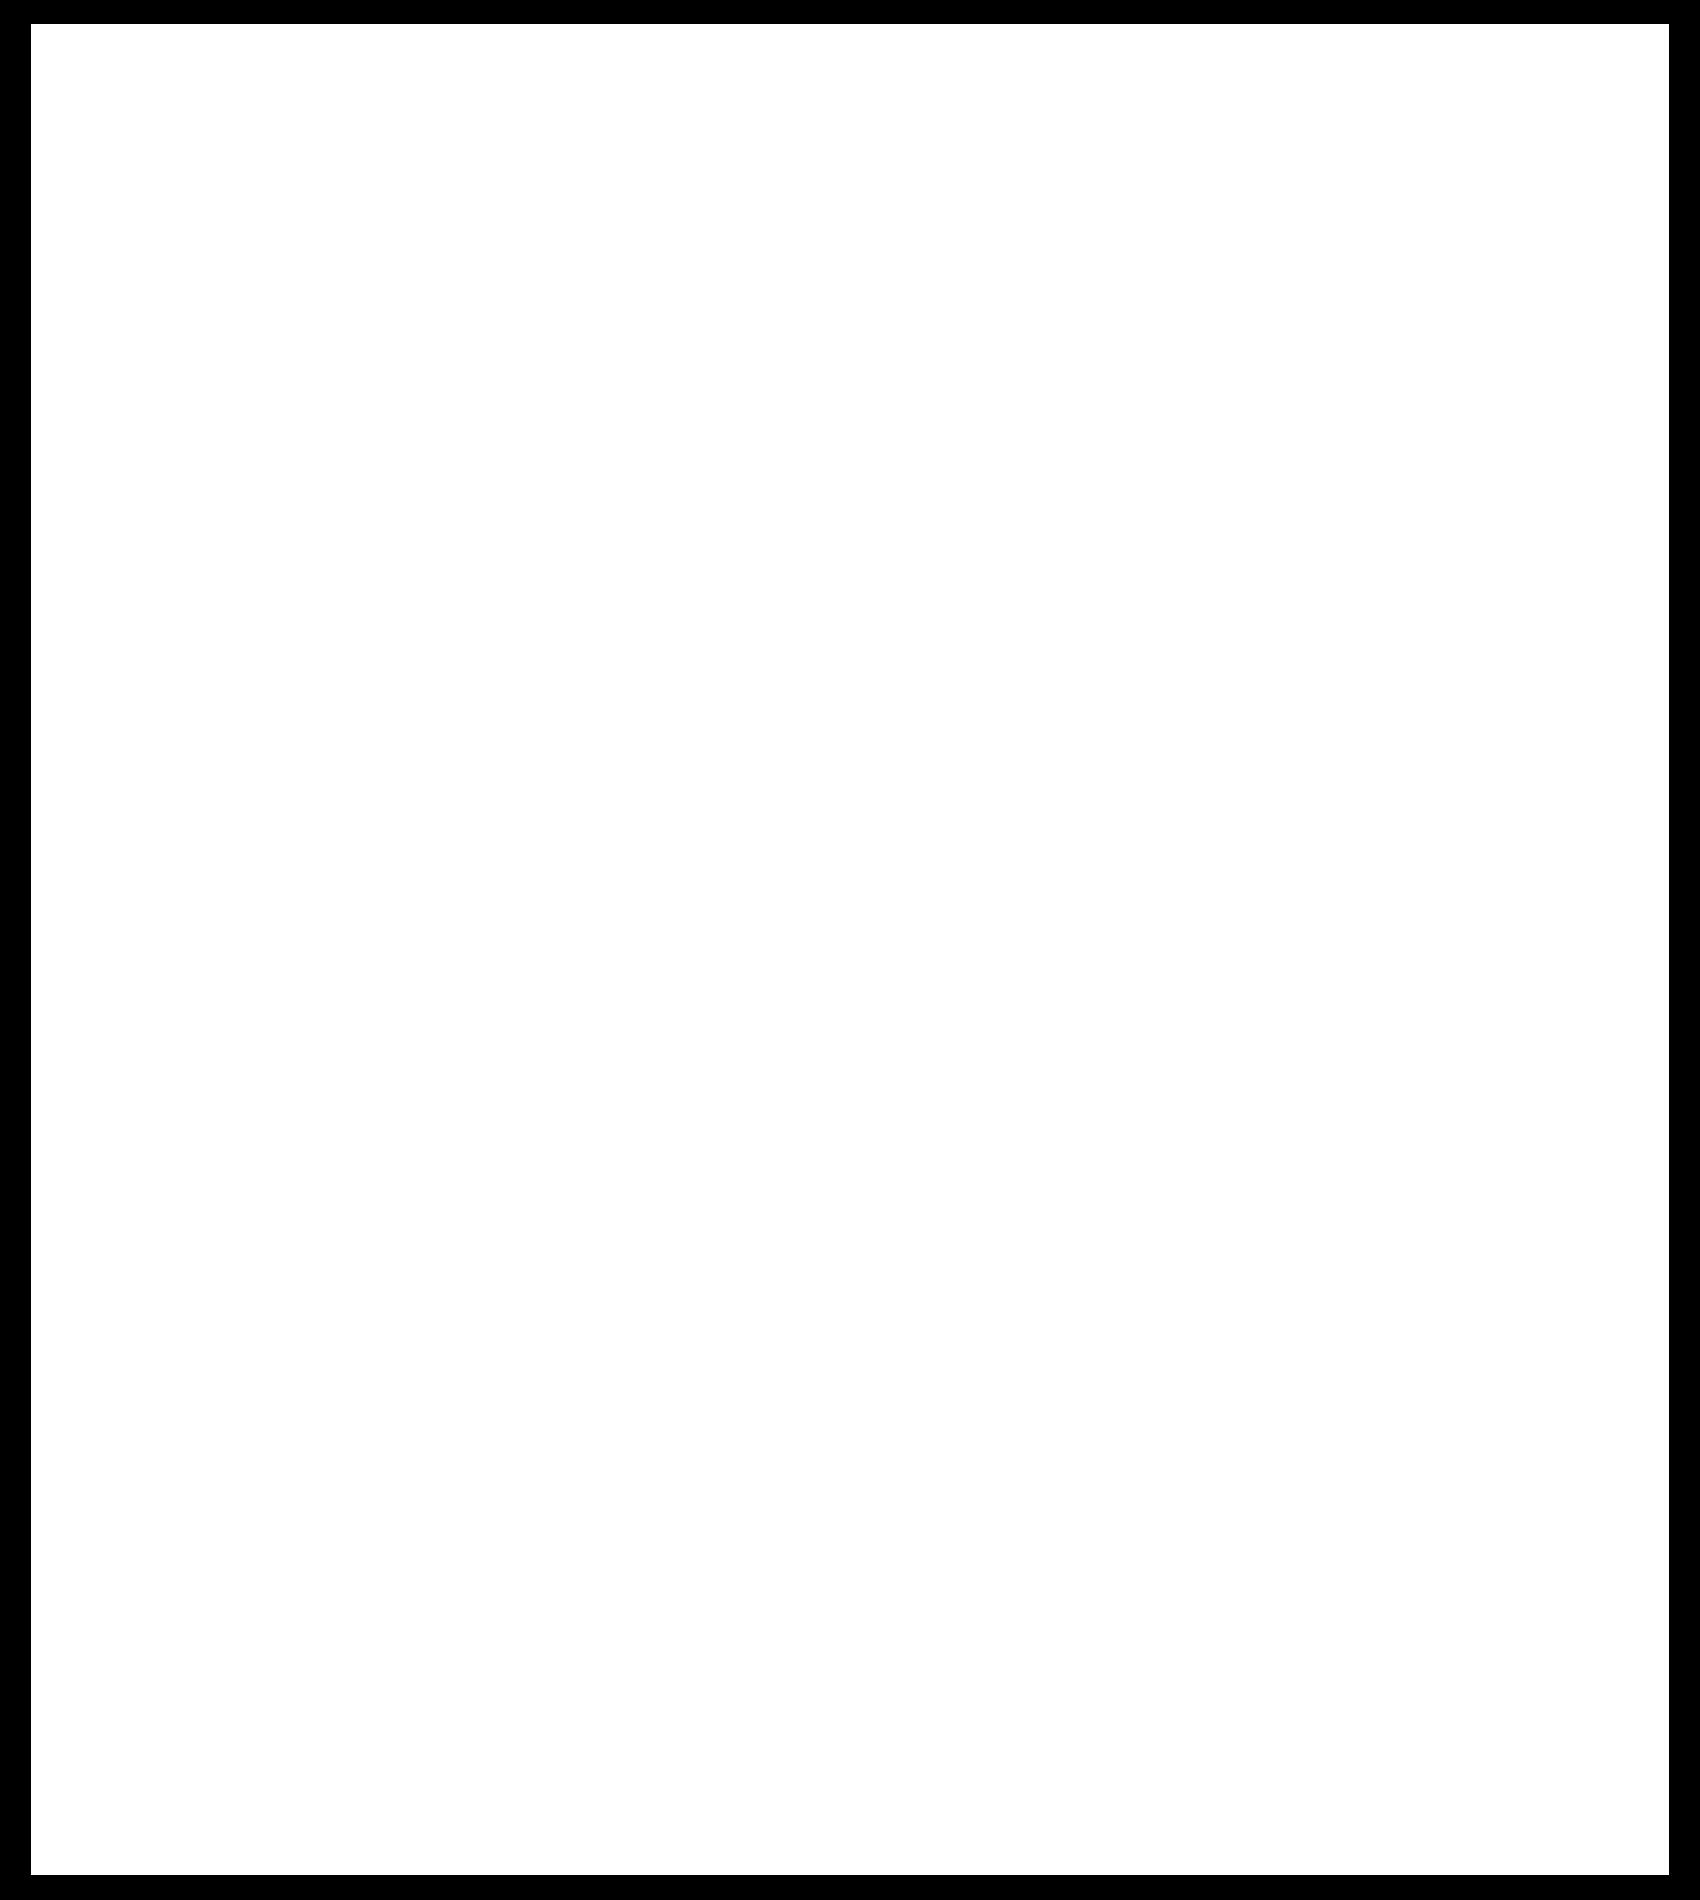 Free White Square Cliparts Download Free Clip Art Free Clip Art On